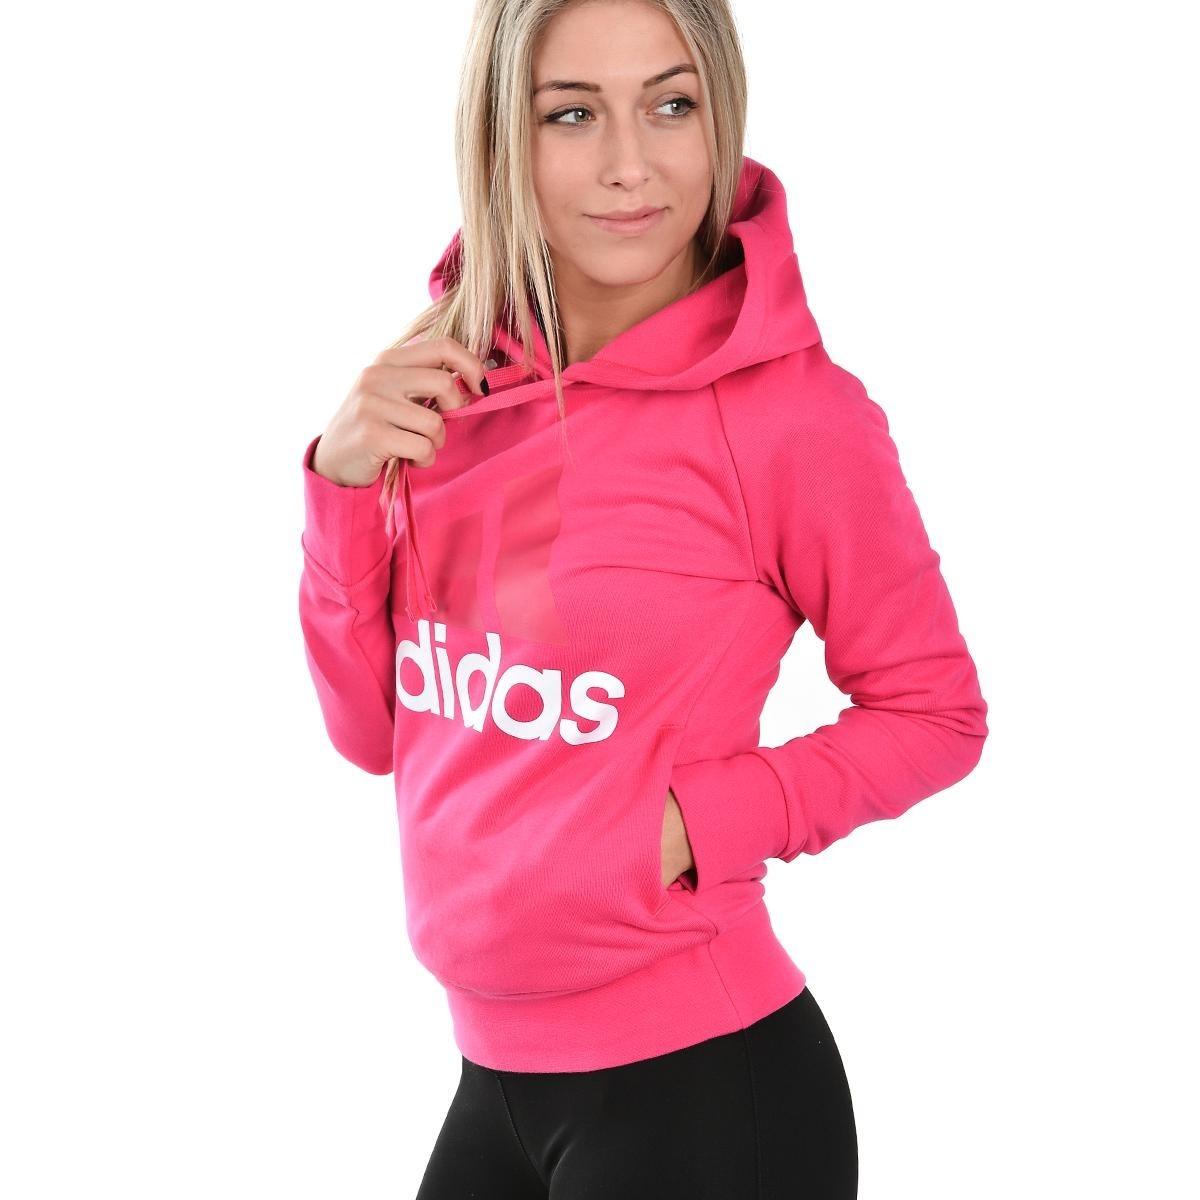 finest selection 477c5 81cfa sudadera adidas essentials linear pullover cz5730. Cargando zoom.